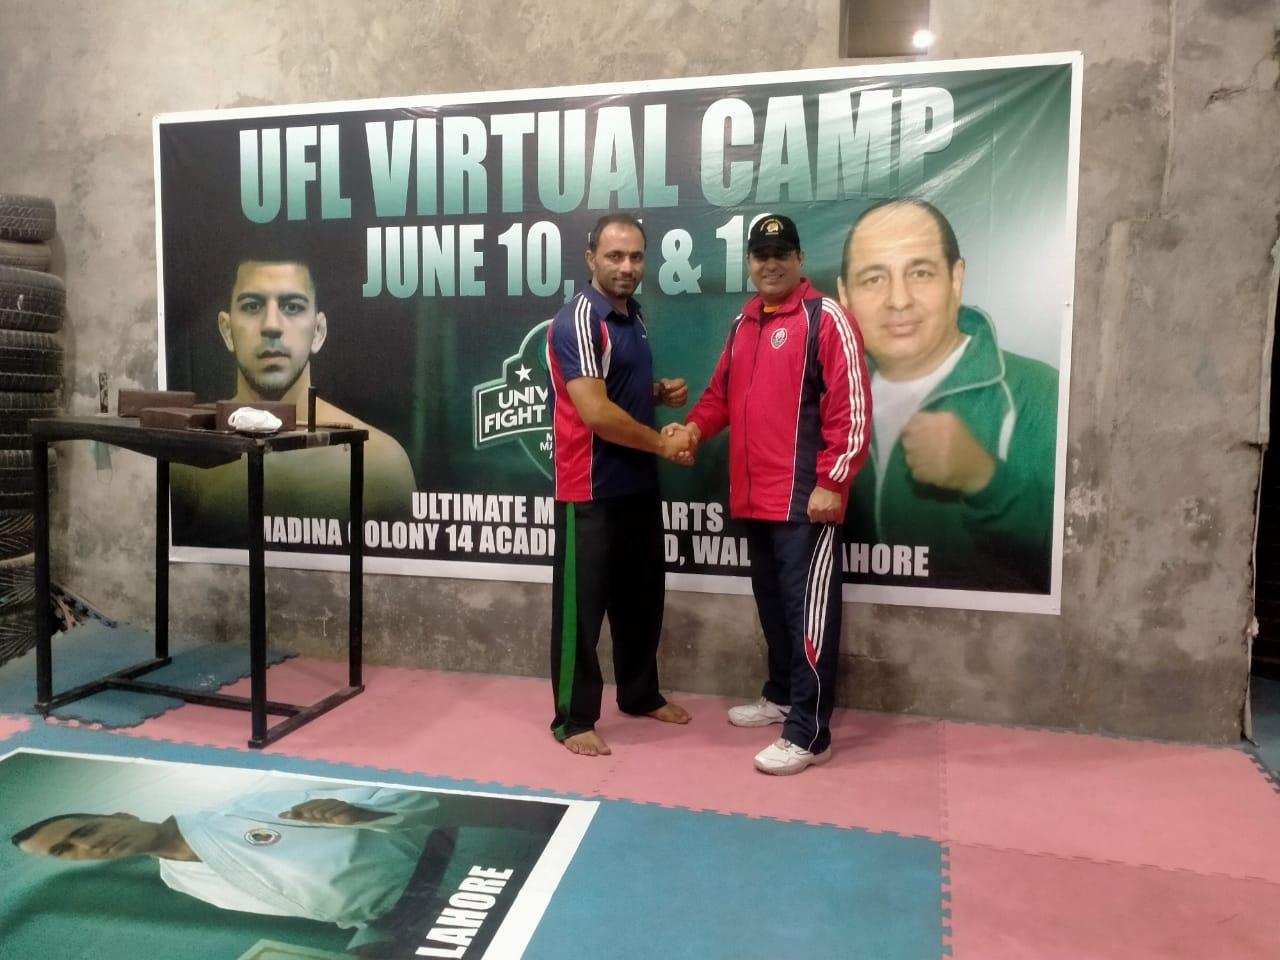 ufl-training-session-in-pakistan